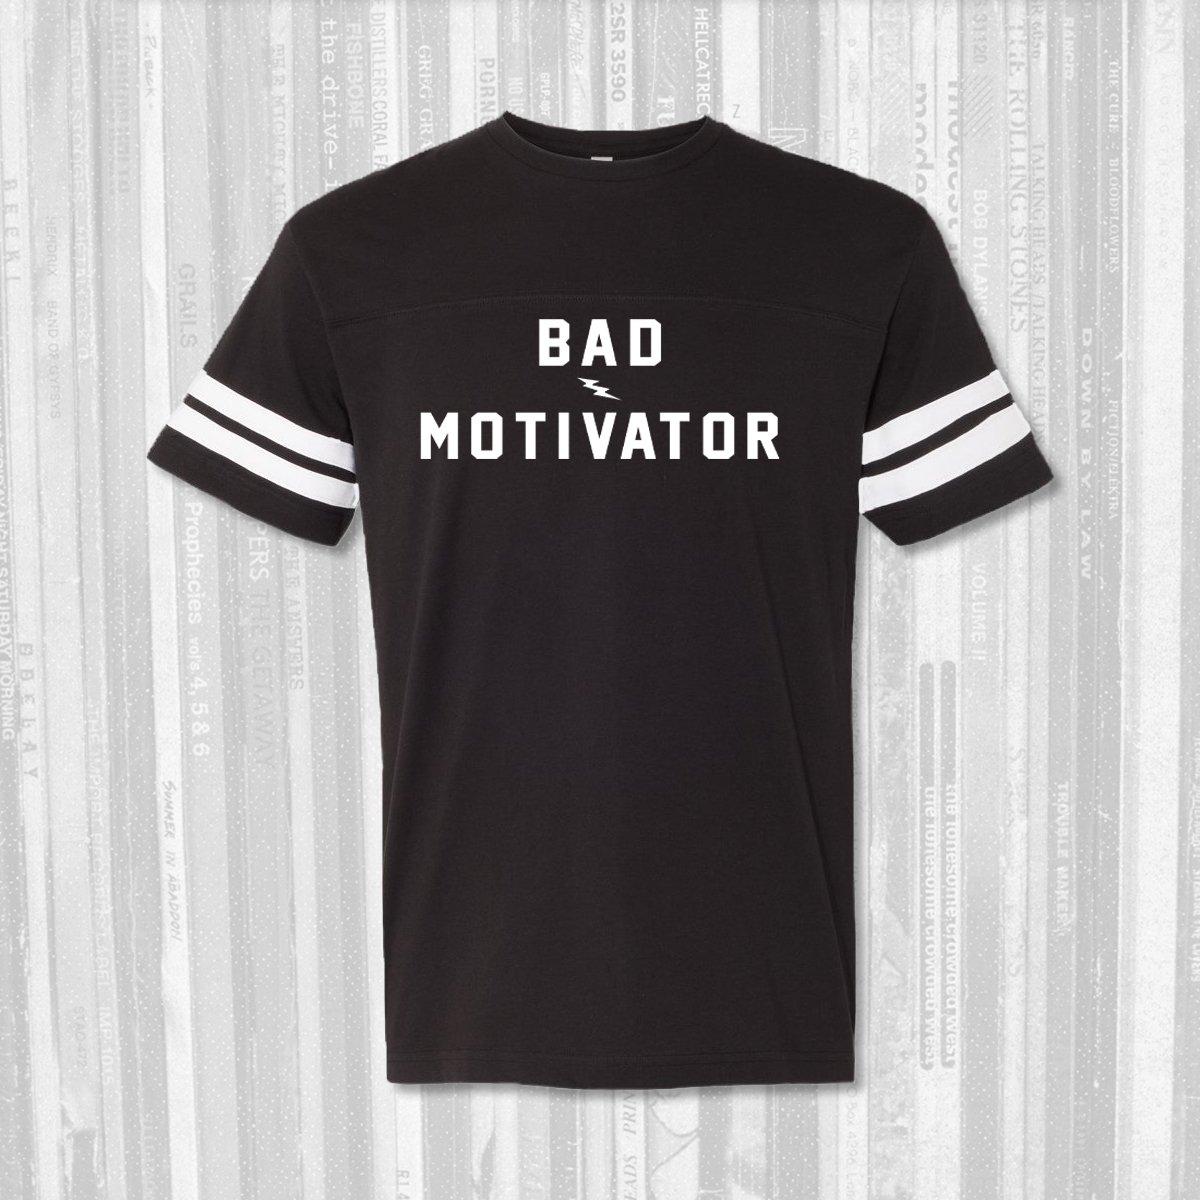 Bad Motivator - Tailgate Tee